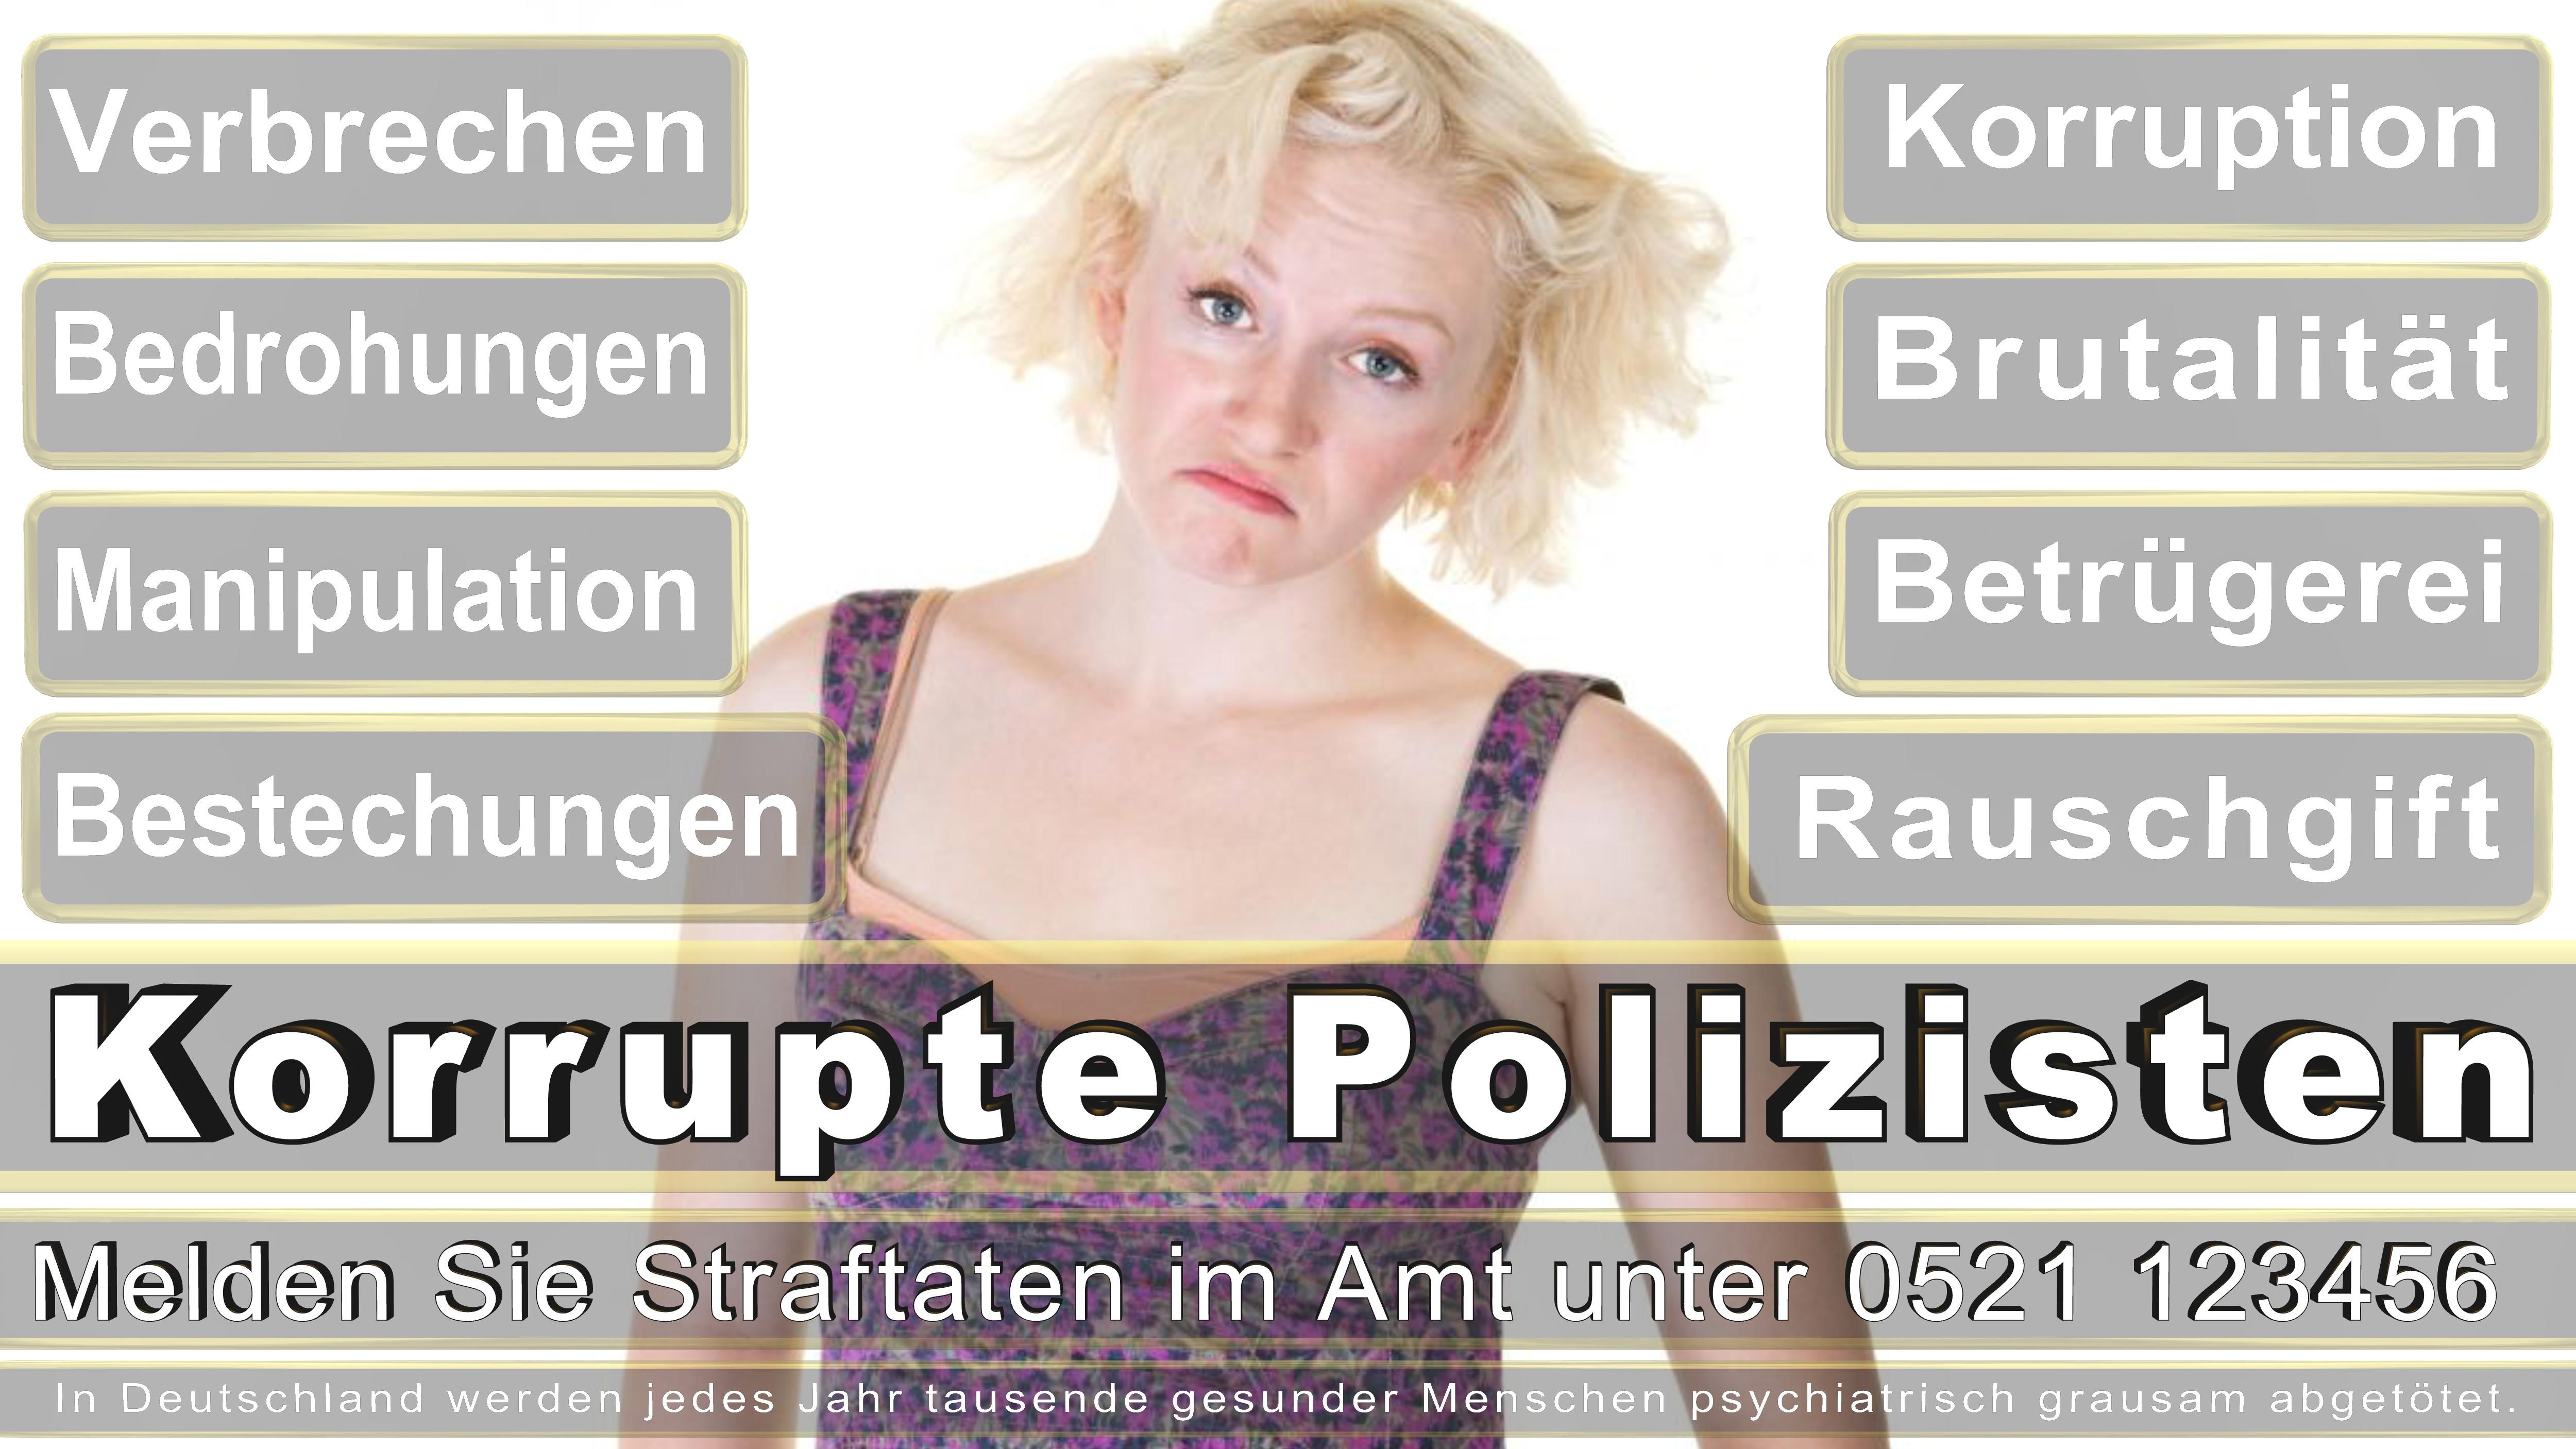 Polizei-Bielefeld-Polizei-Bielefeld-Polizei-Bielefeld (184)